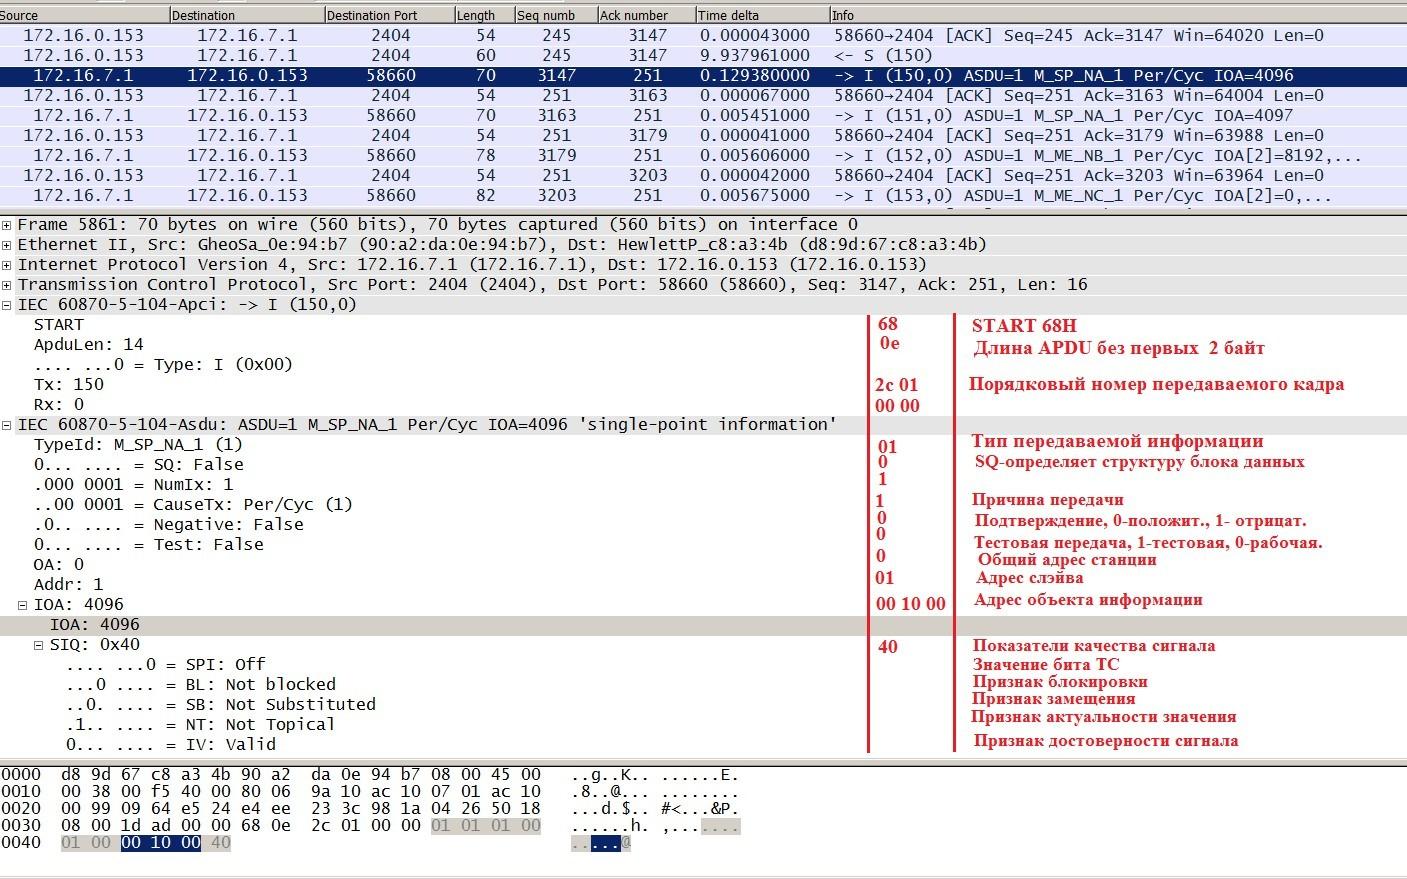 Как я писал библиотеку под МЭК 870-5-104 на Arduino при помощи Wireshark - 18